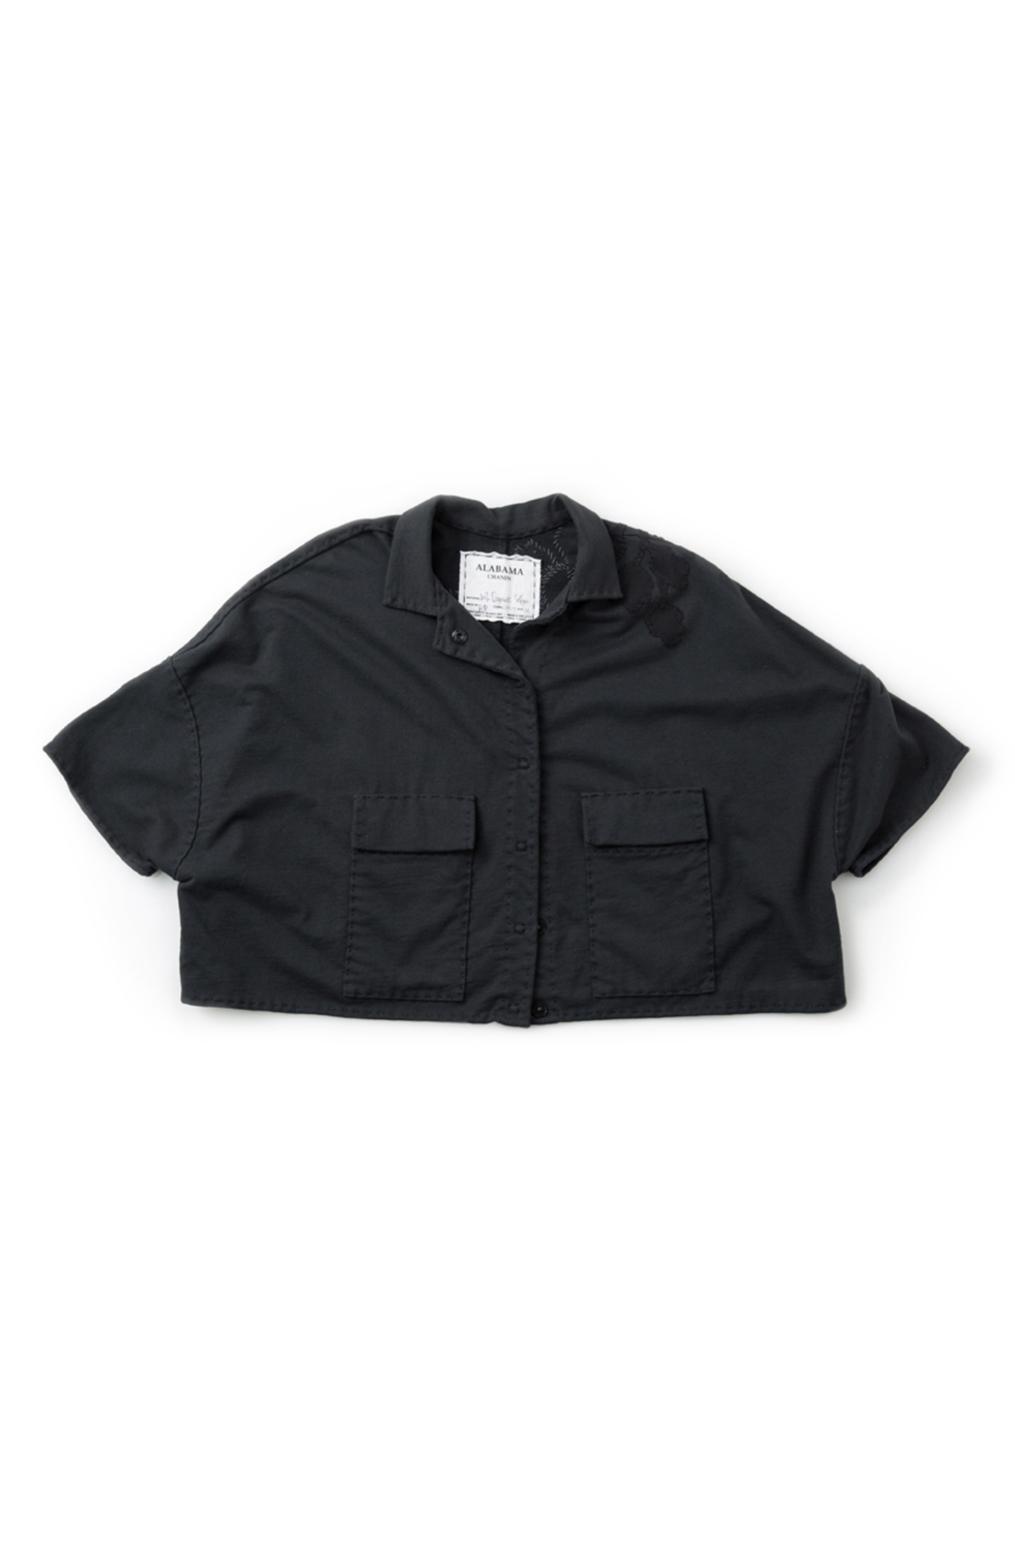 The school of making car coat pattern 4